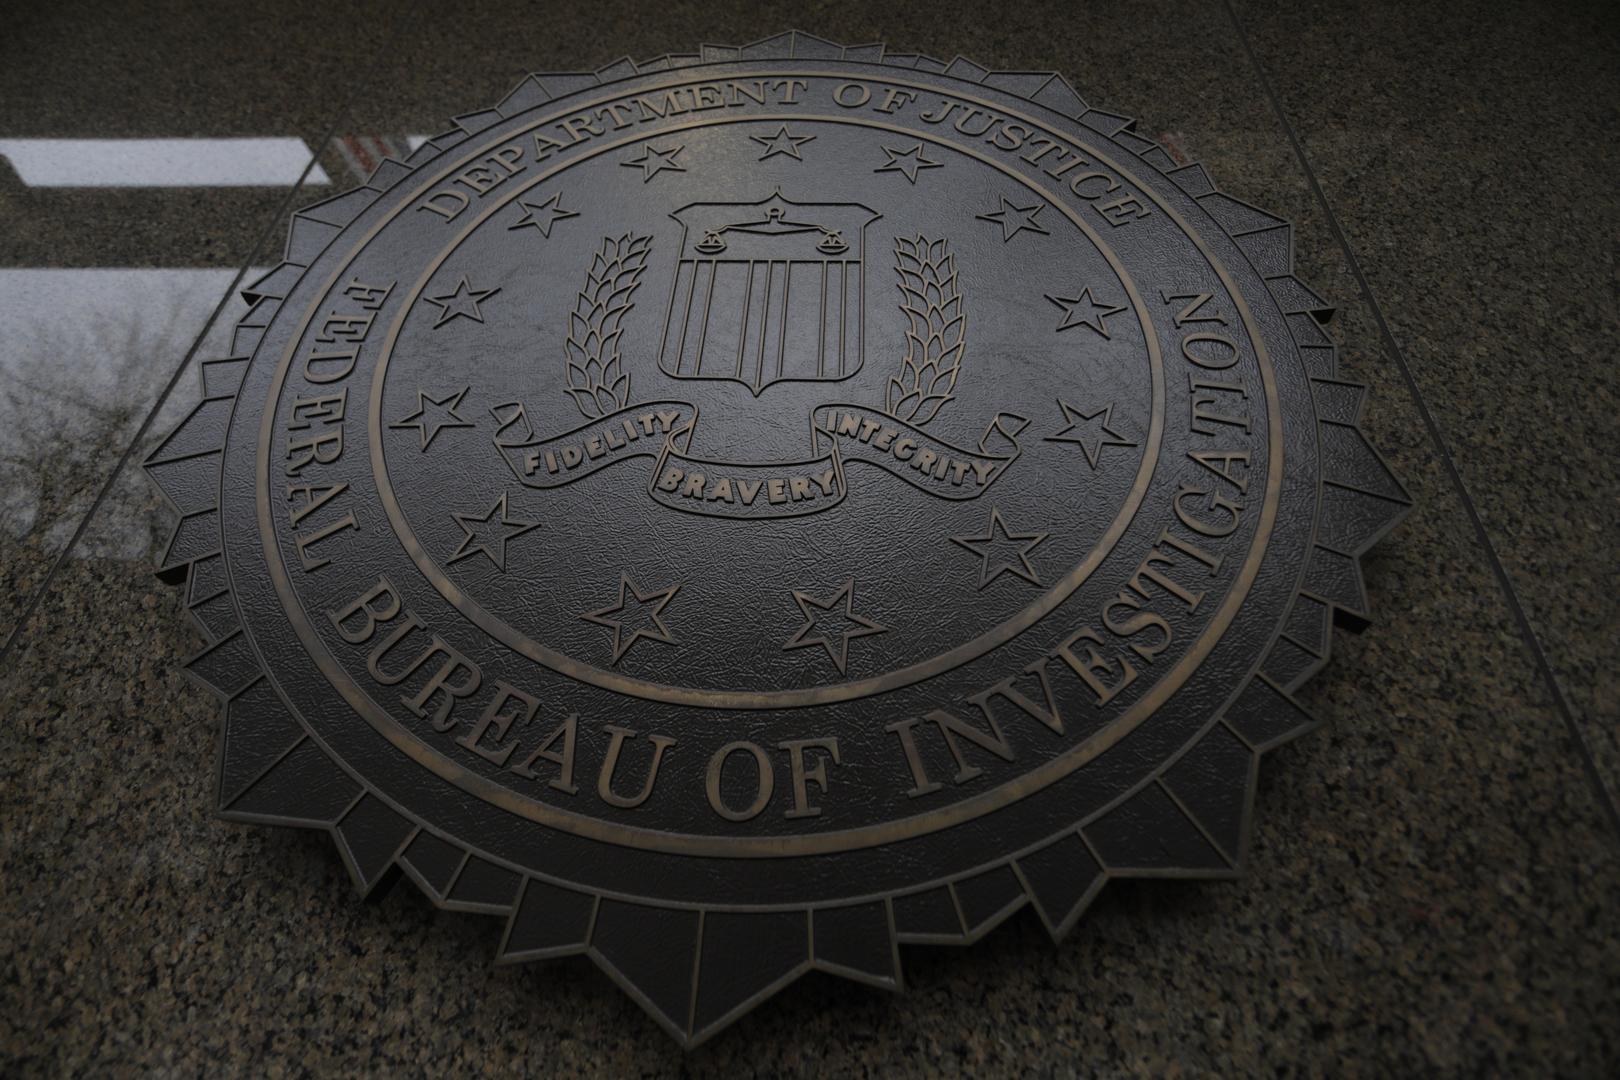 FBI : متطرفو اليمين قد يتنكرون بزي الحرس الوطني